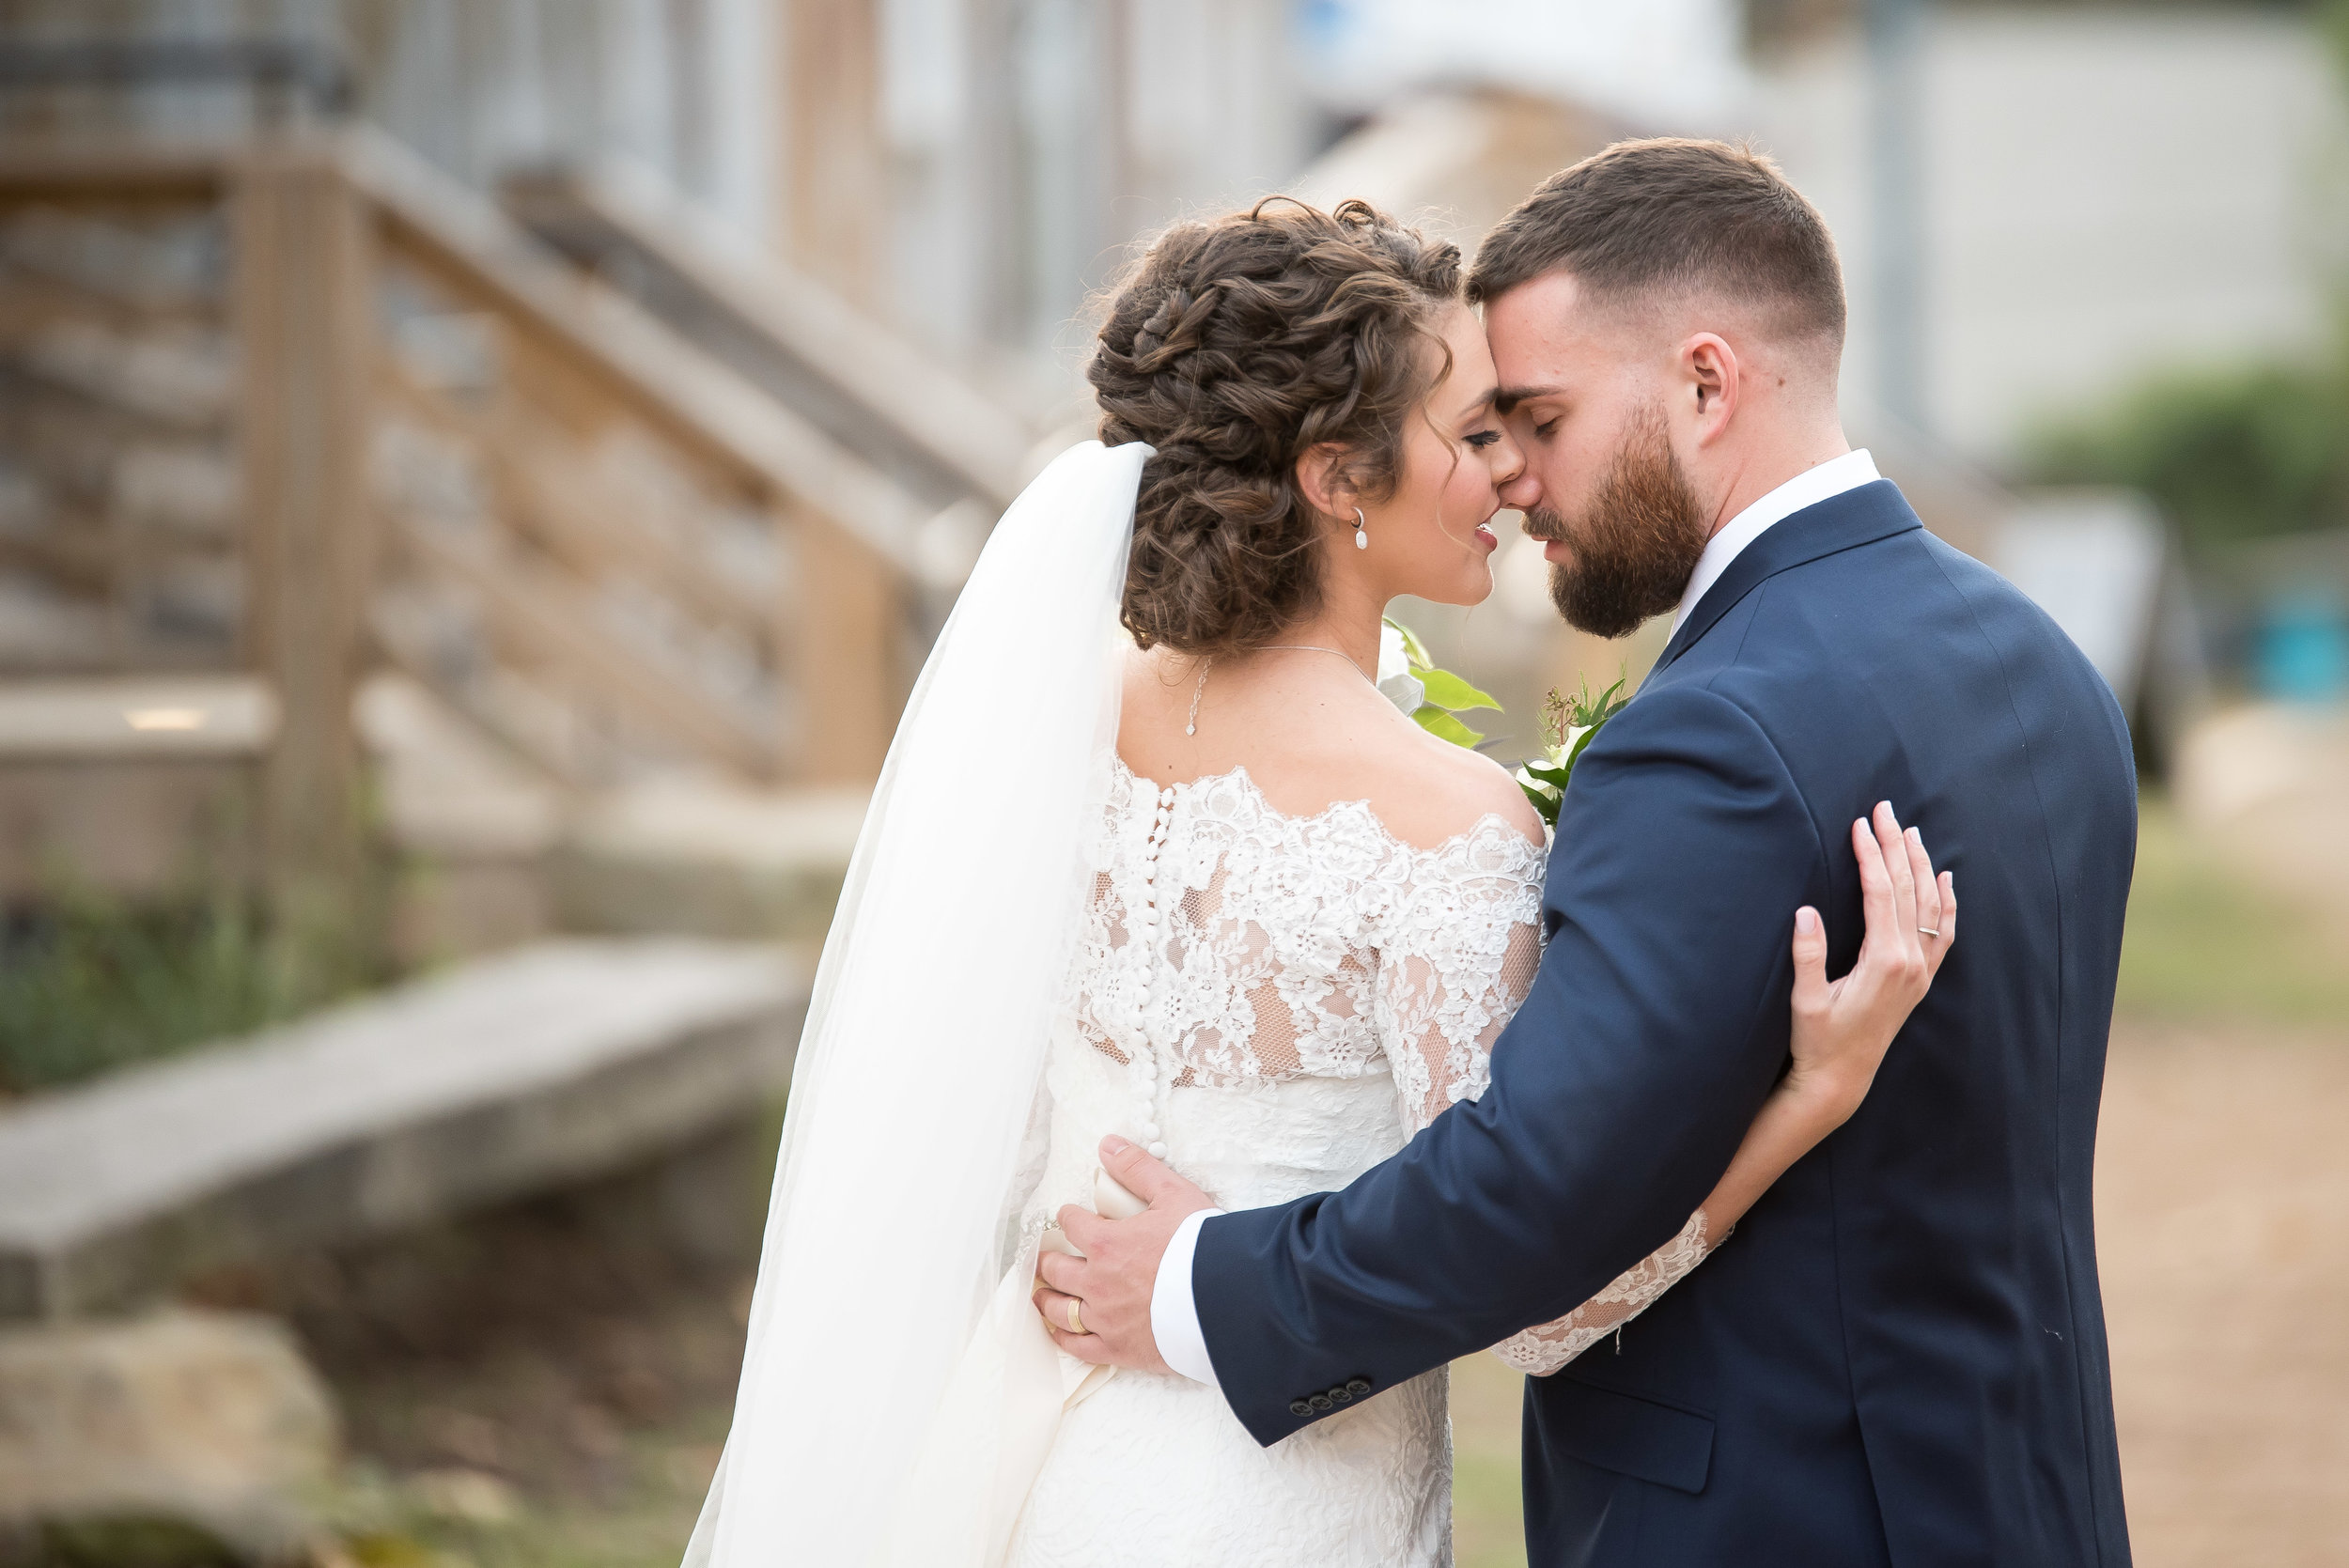 The Roller Mill Events - Winston Salem Weddings - NC Weddings - High Point NC Weddings - Winston Salem Venue - Yasmin Leonard Photography-50.jpg